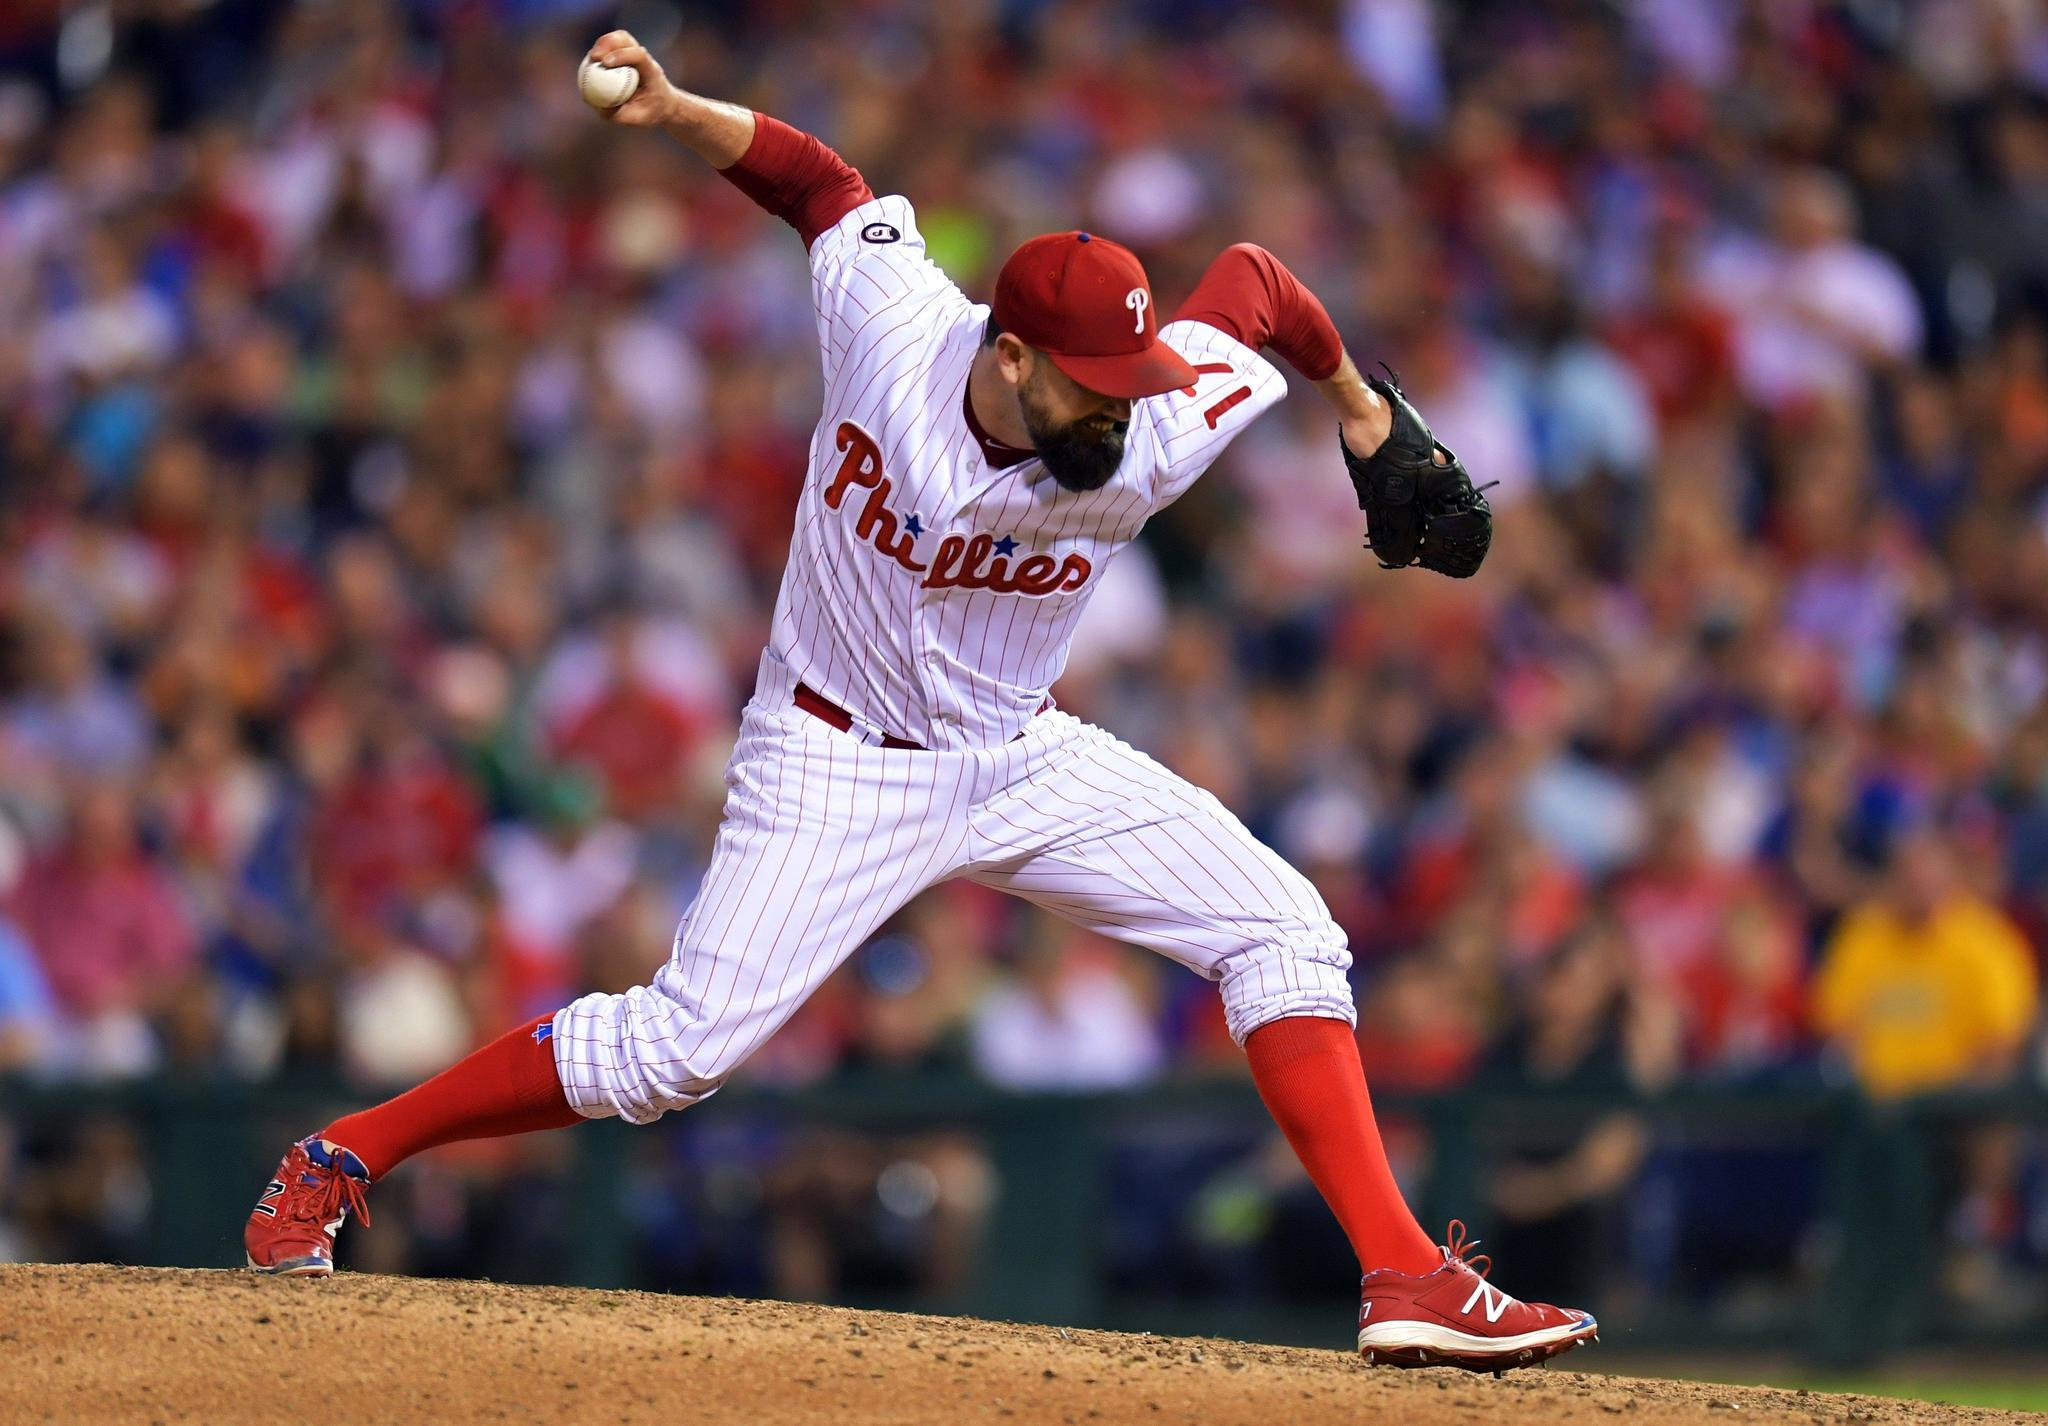 Phillies trade deadline odds: Who gets dealt? - The ... Trade Deadline